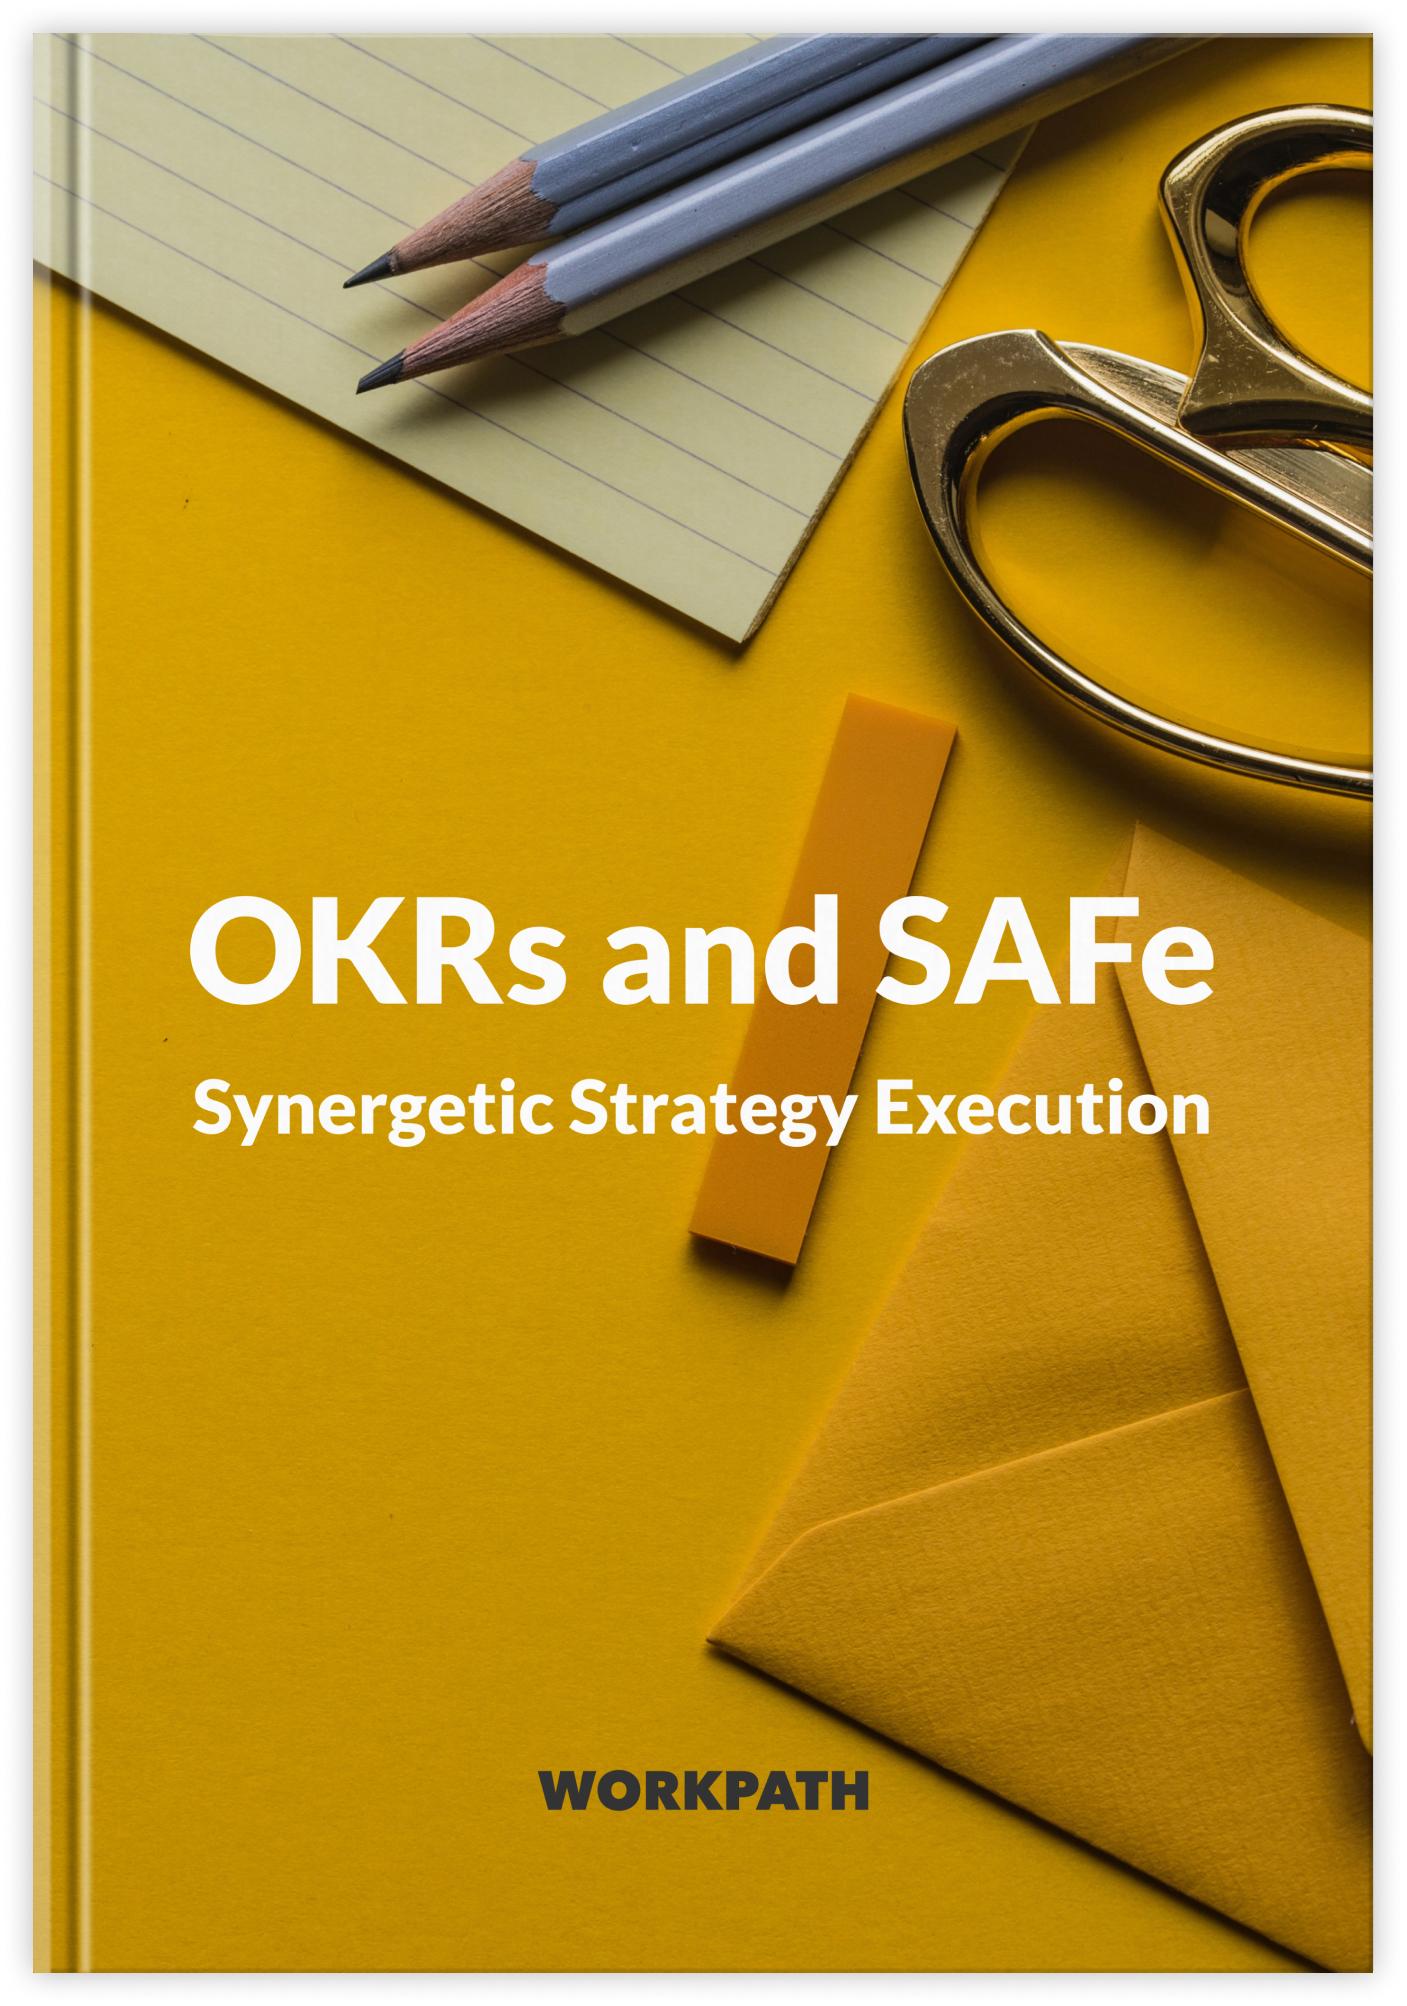 OKRs and SAFe